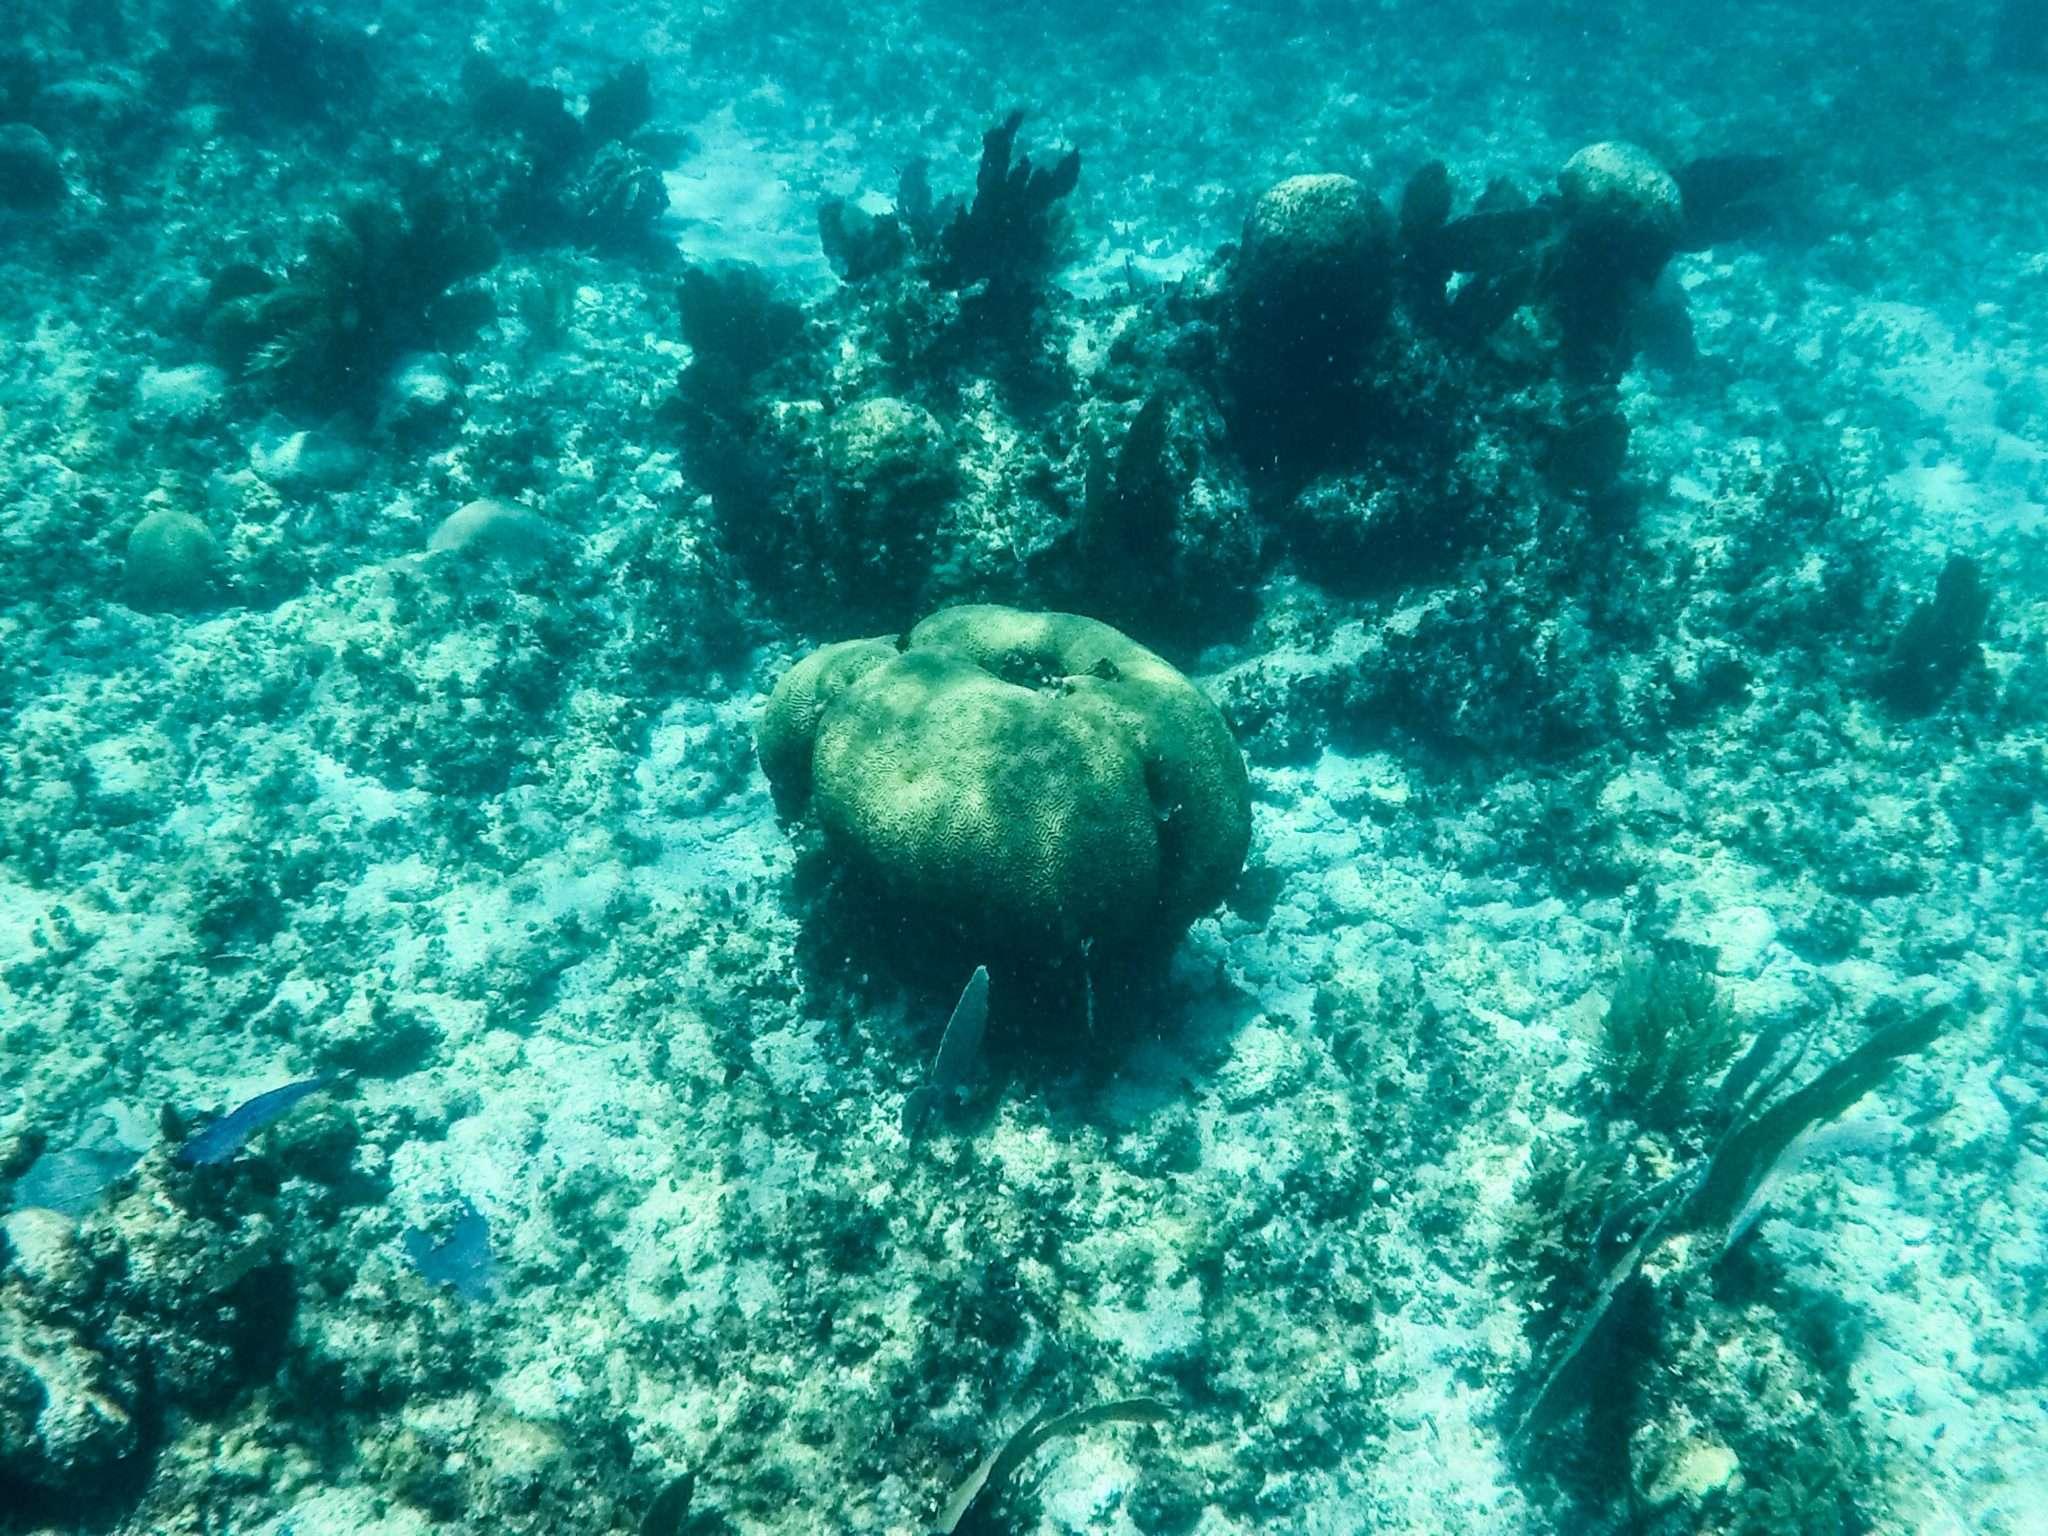 Sian Ka'an reef